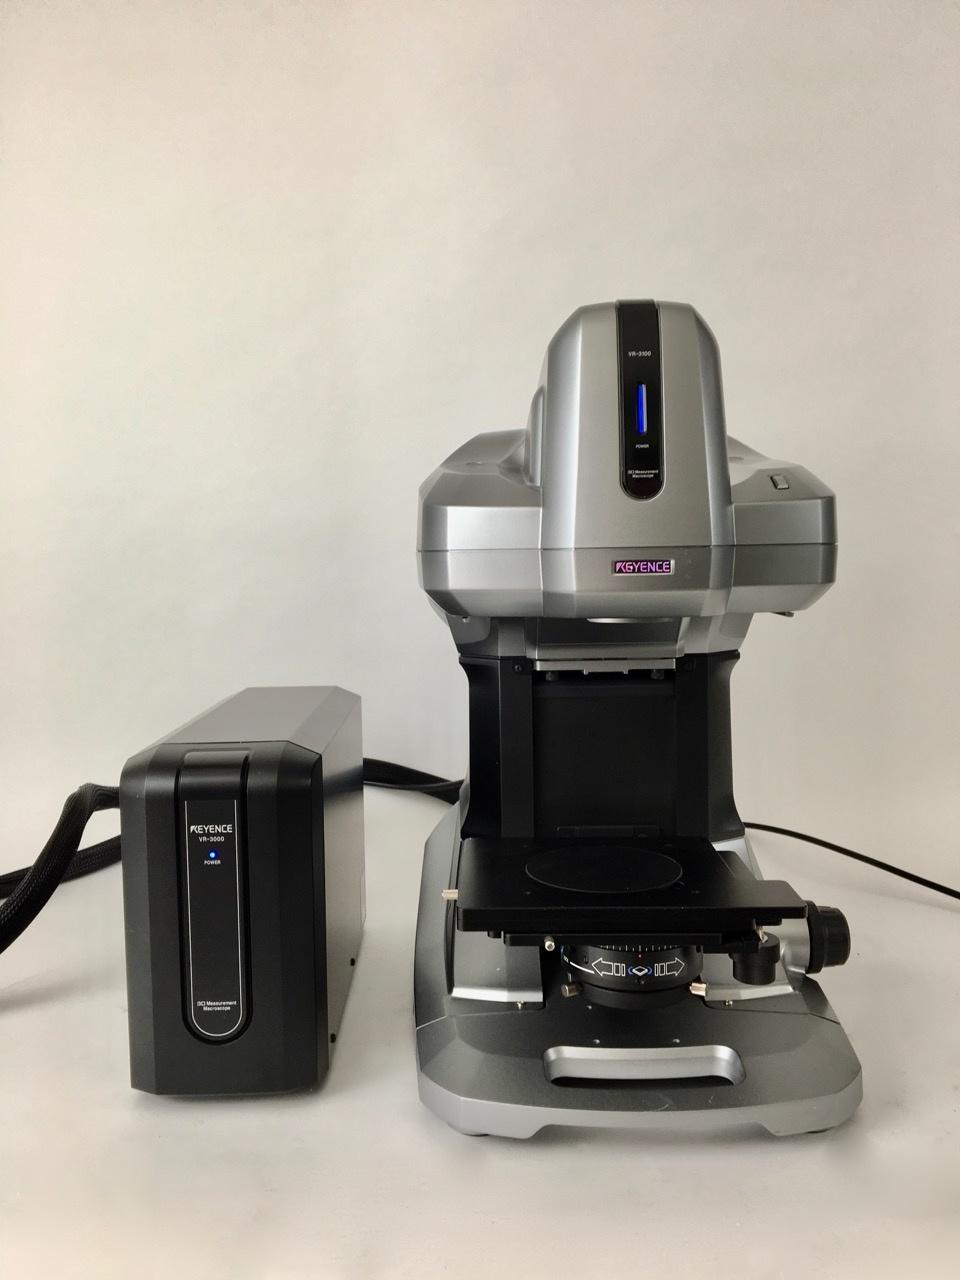 Keyence Keyence VR-3100 Wide-Area 3D Measurement System